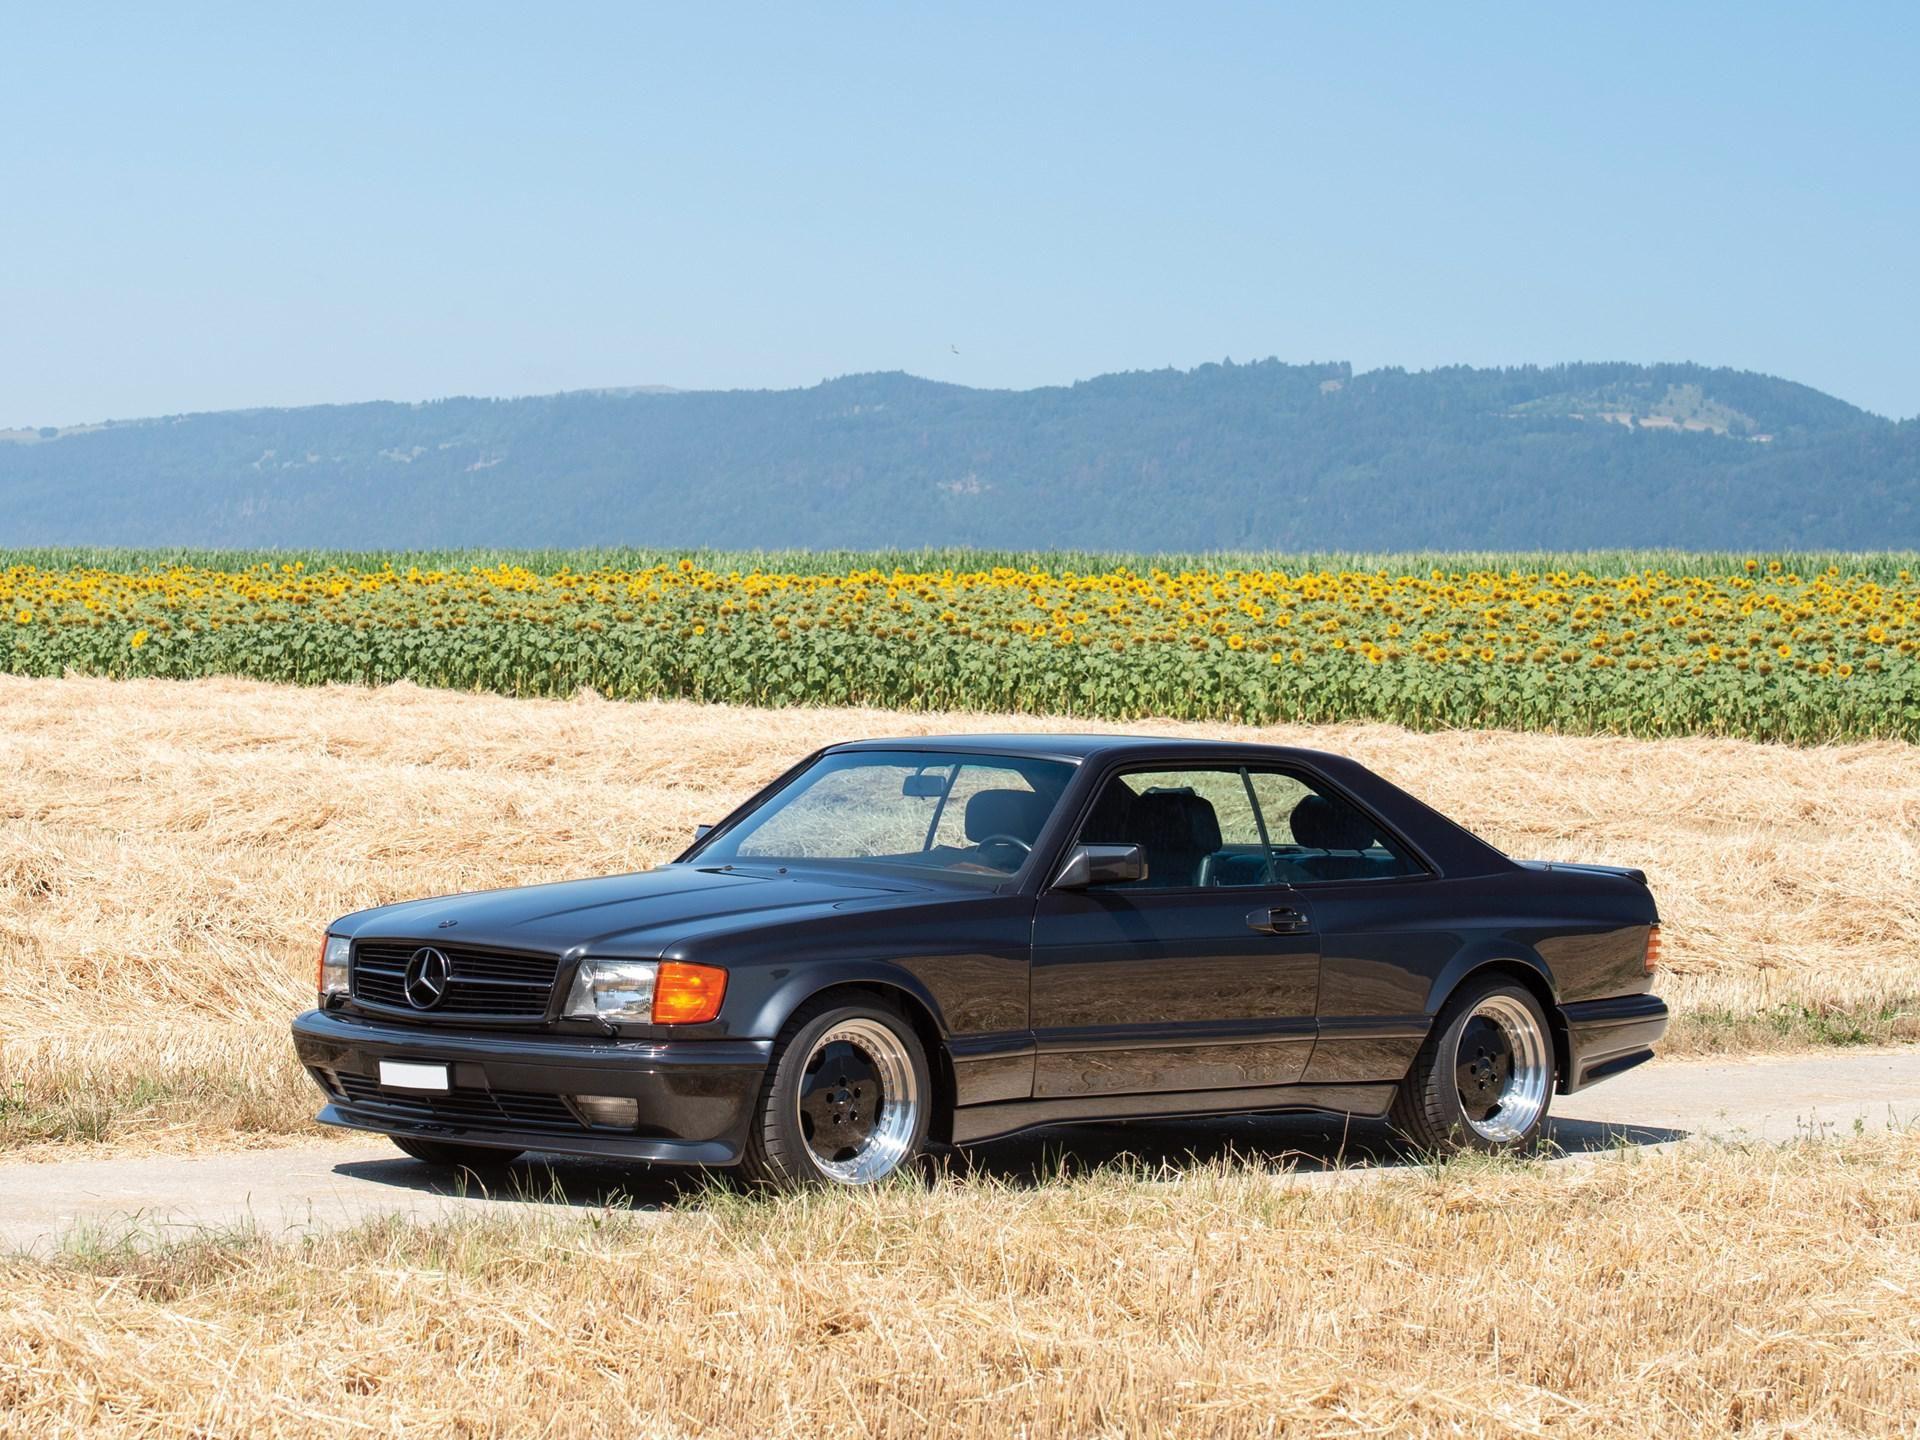 1991 Mercedes-Benz 560 Sec AMG 6.0 'Wide-Body'